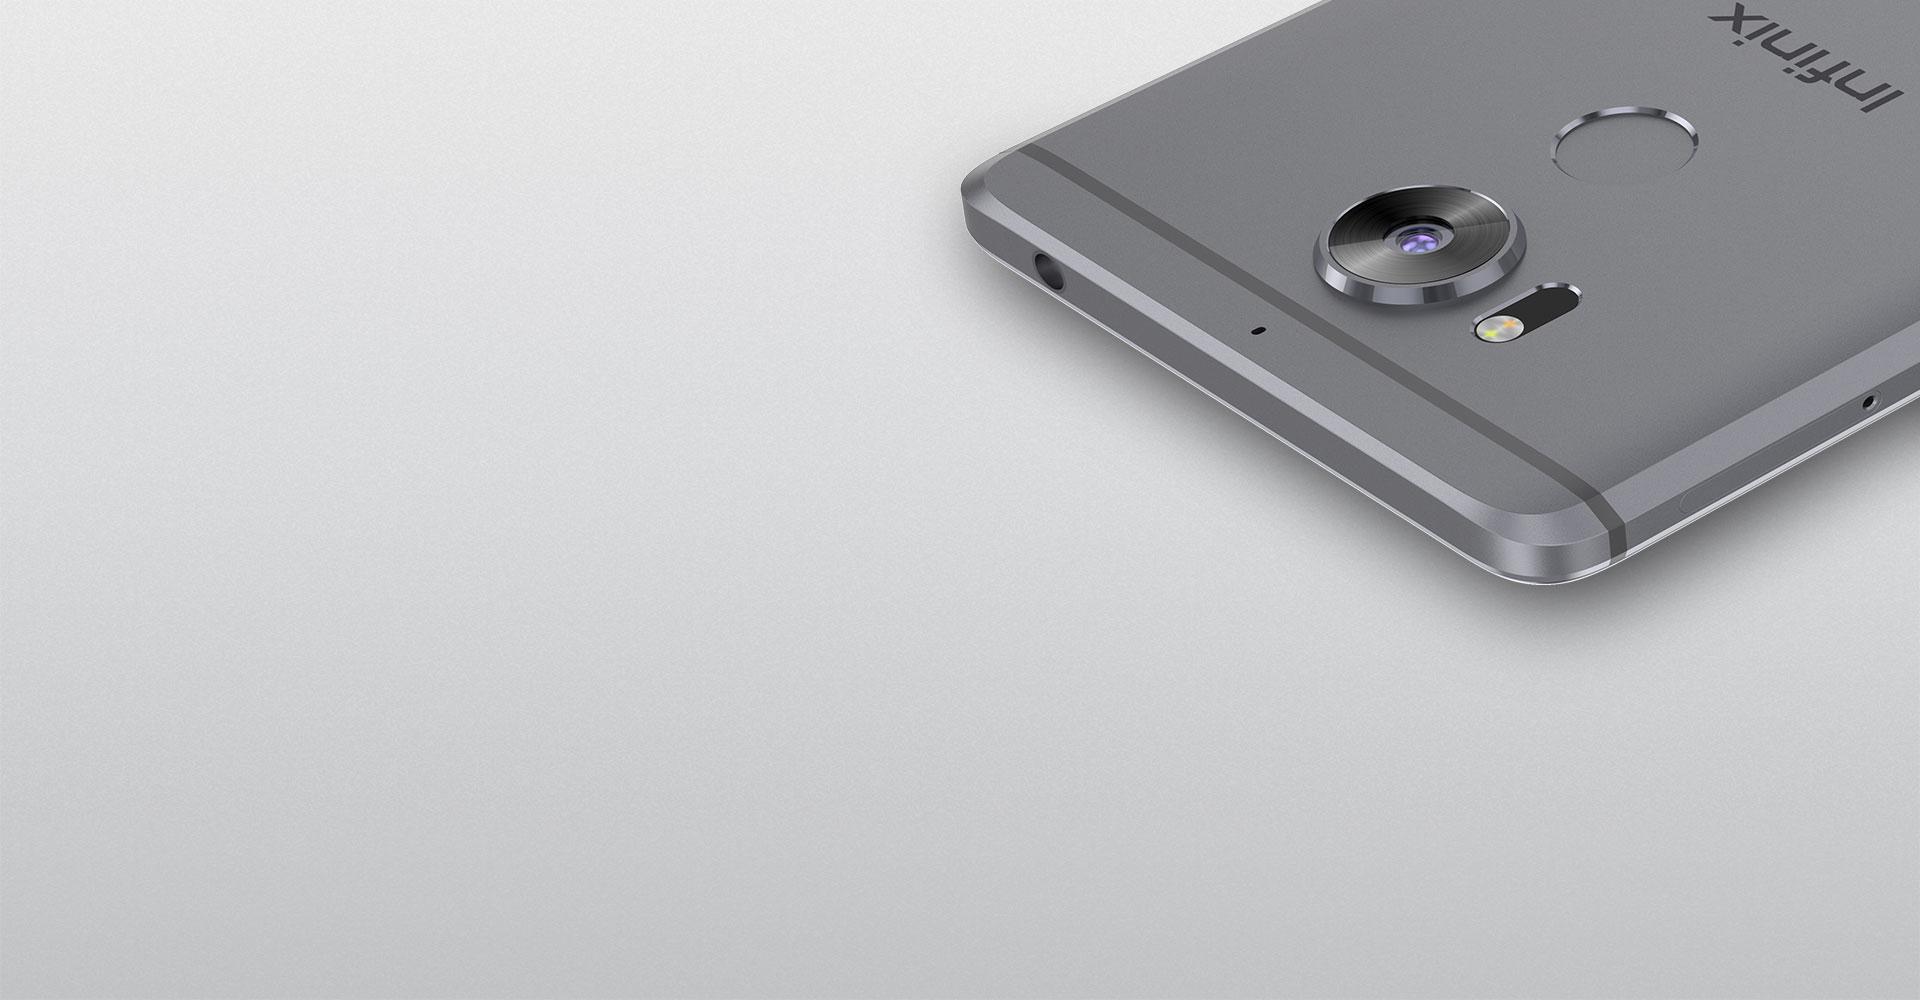 https://vmart.pk/wp-content/uploads/2017/05/products-laser-sharp.jpg